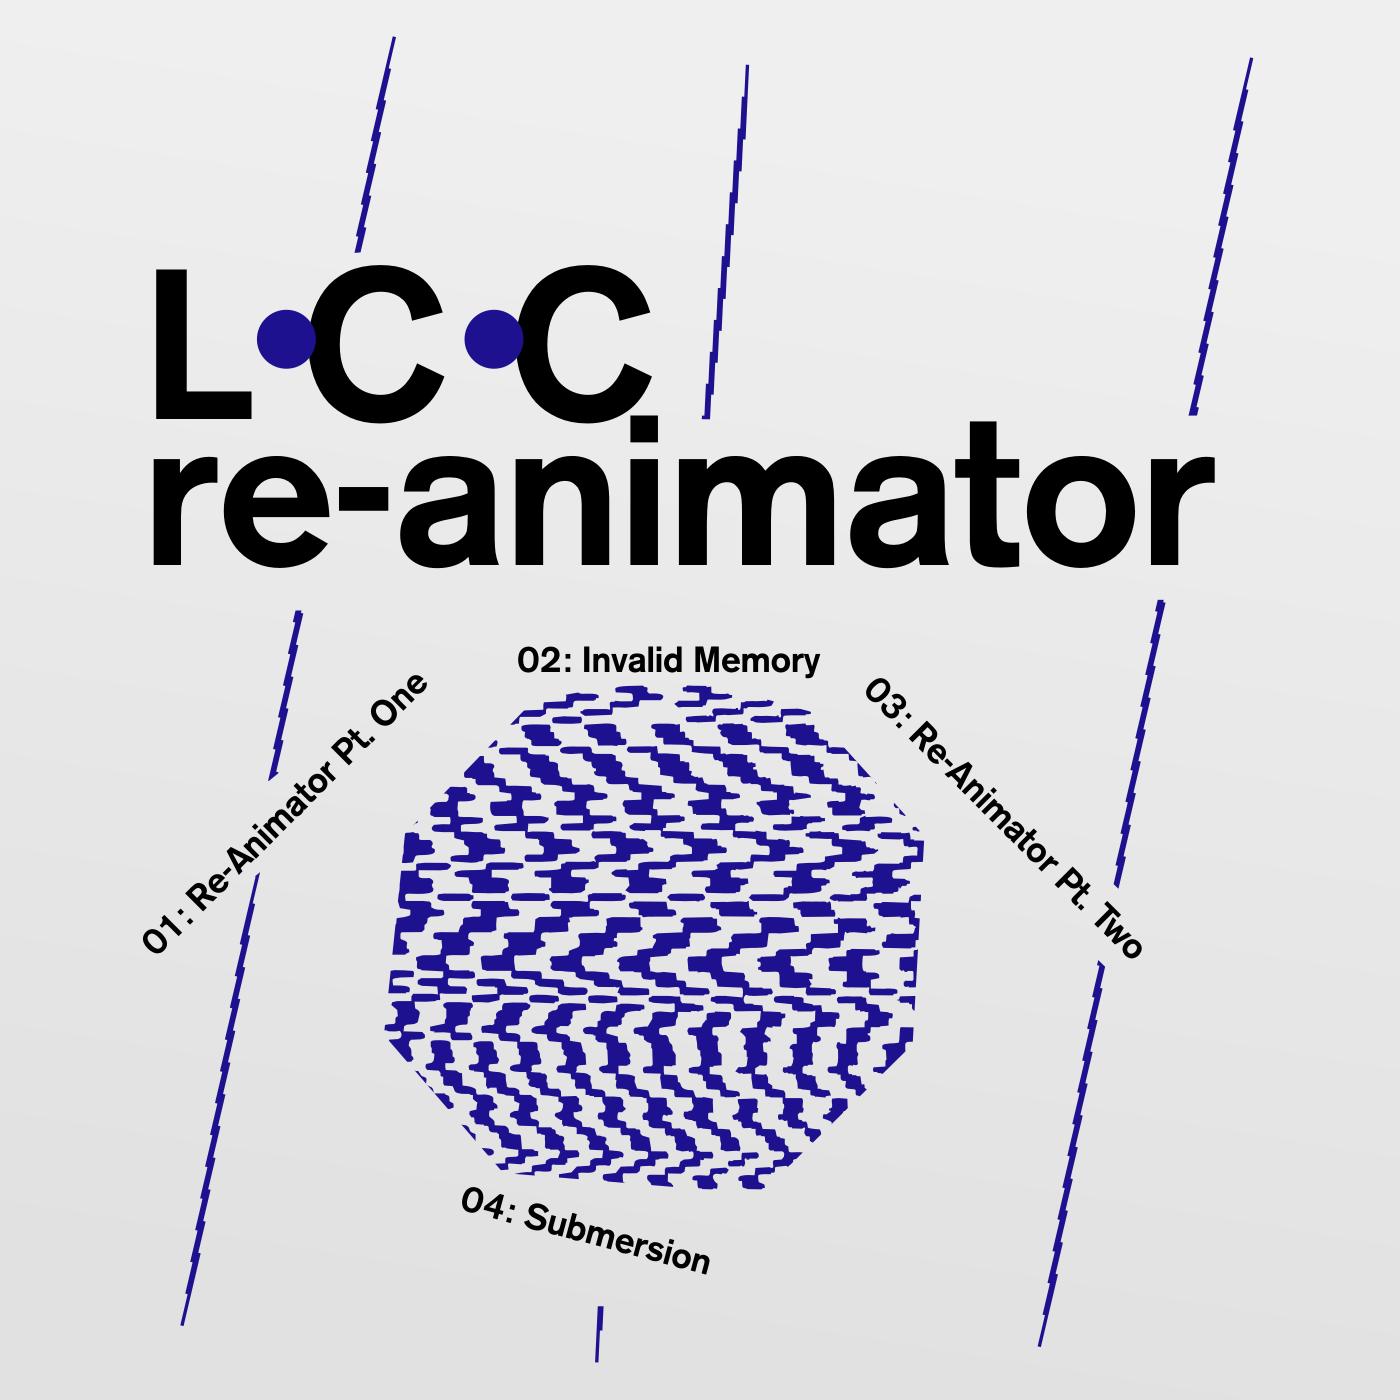 LCC - Re-Animator - 1400x1400 (1).png